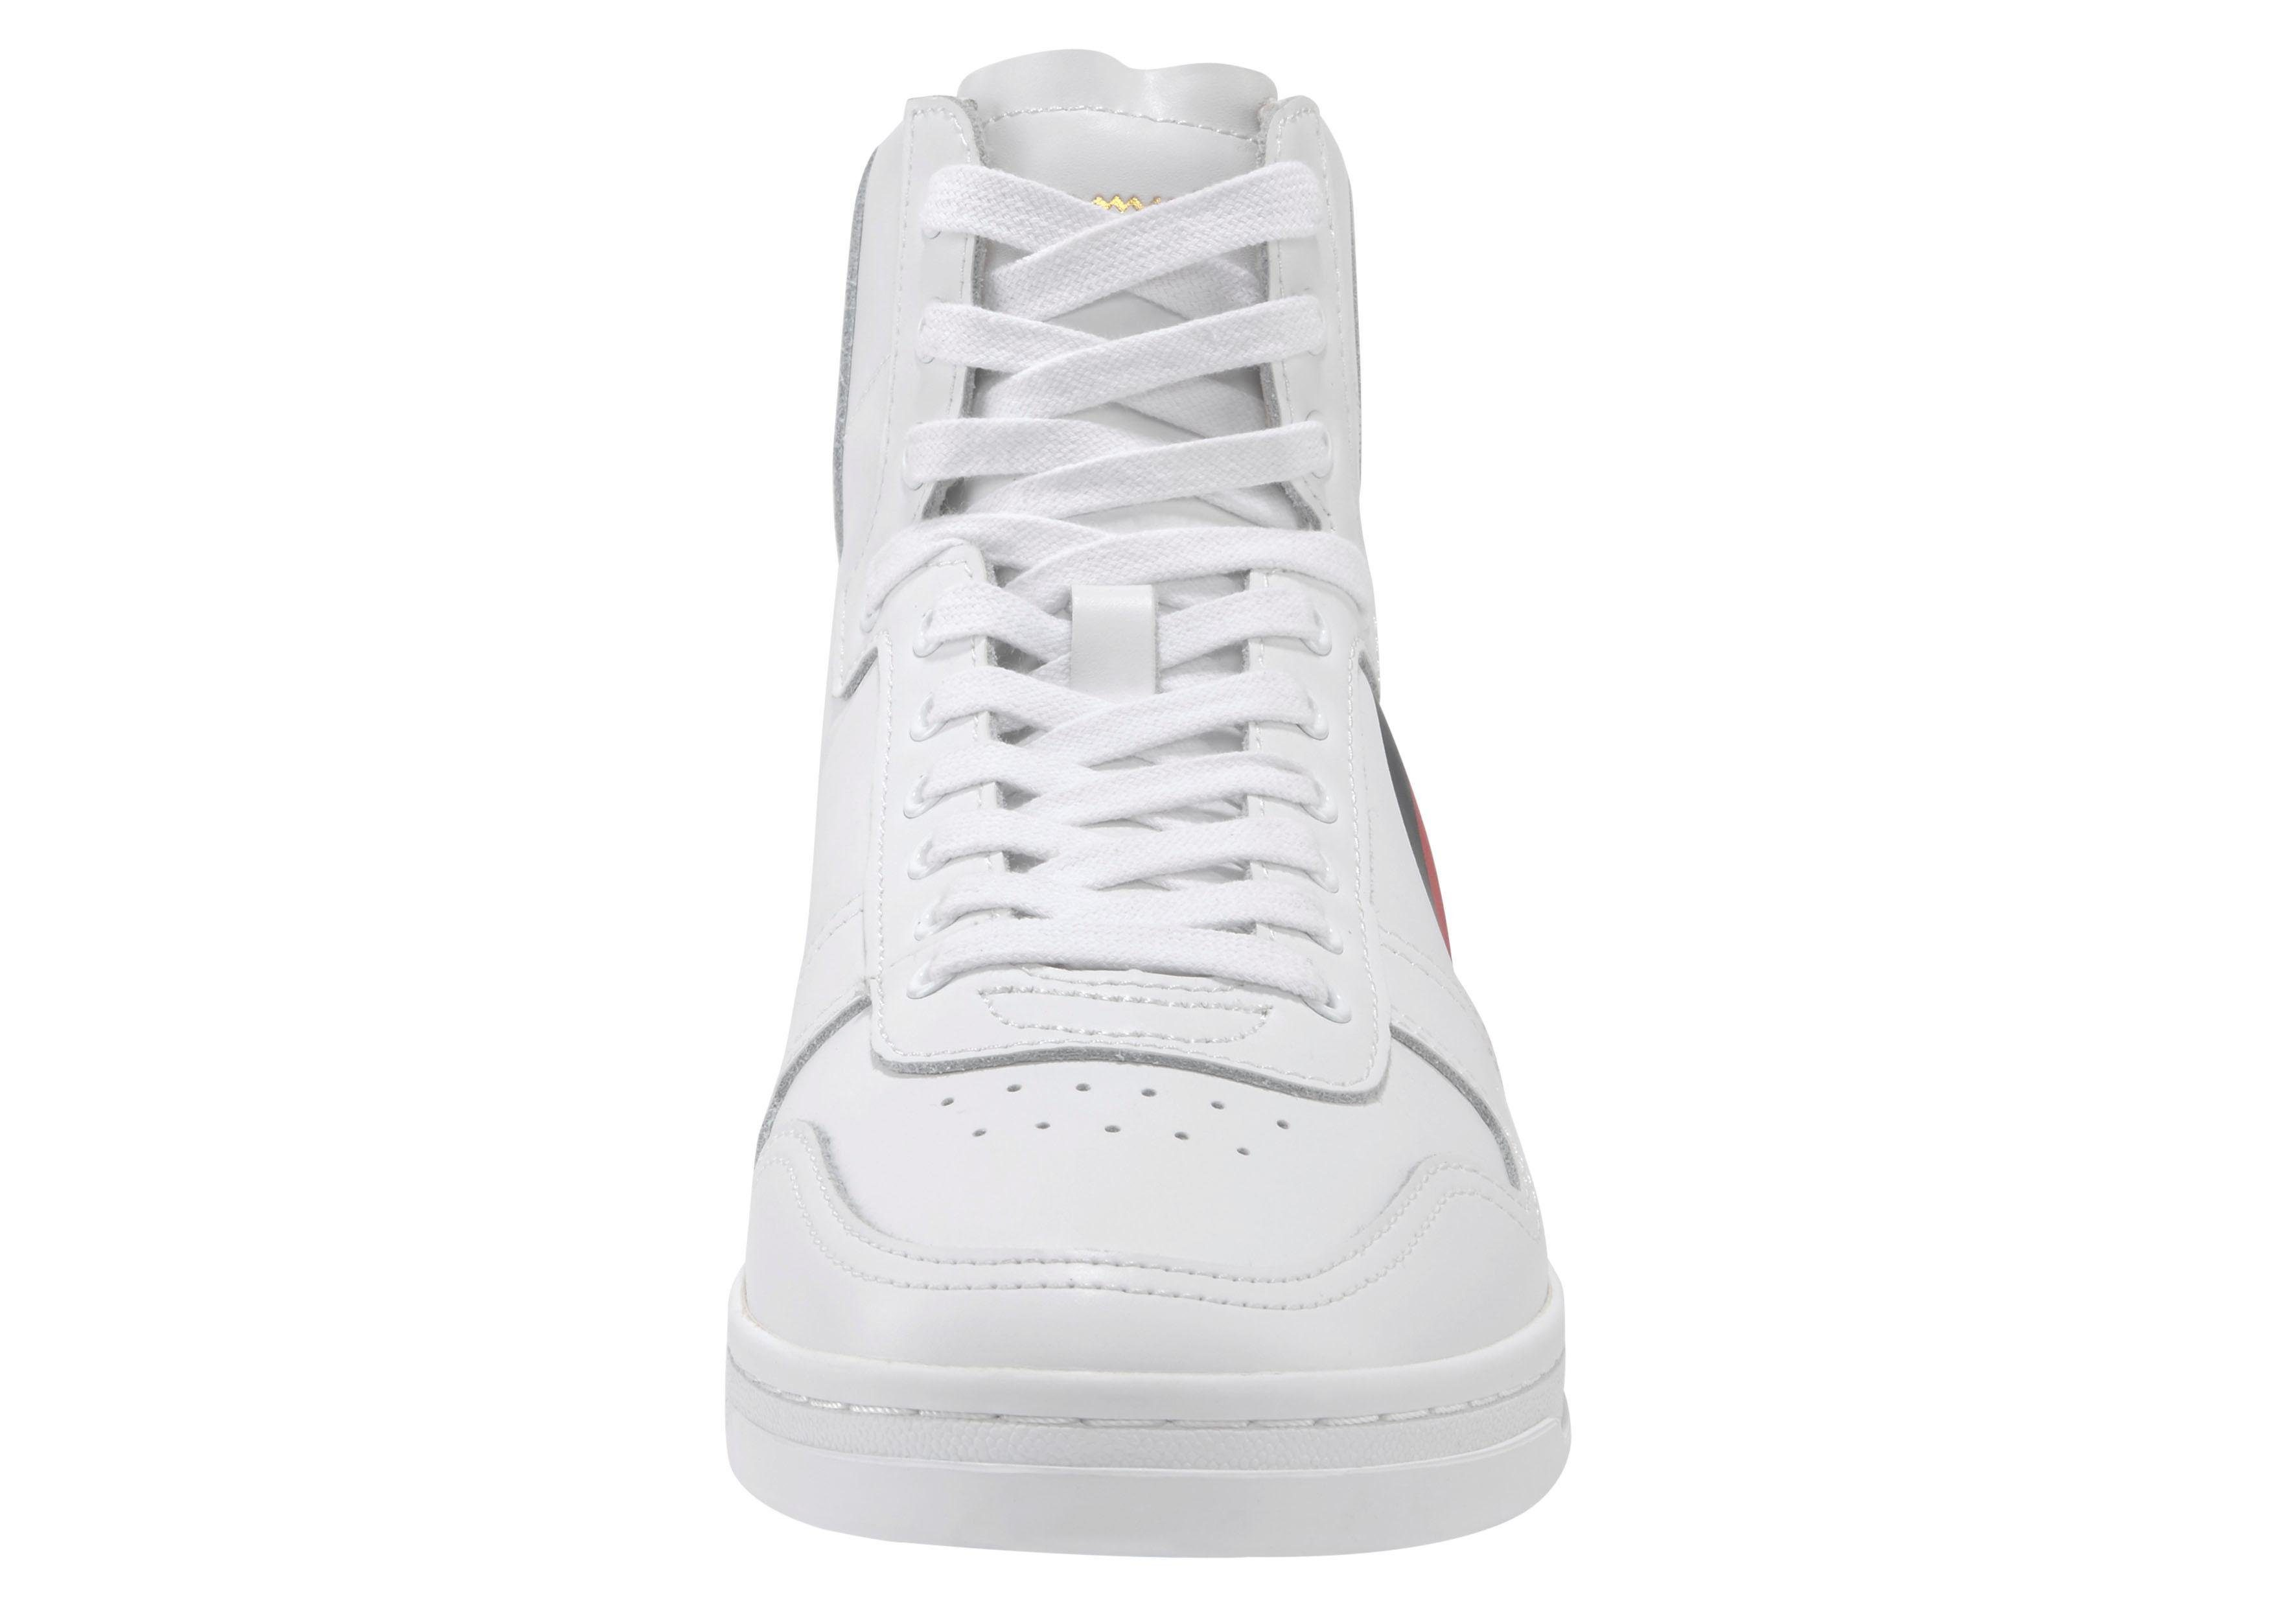 Kaufen Aus Leder Champion Obermaterial »919 Mid« Online Pro SneakerStrapazierfähiges PukZTOXi